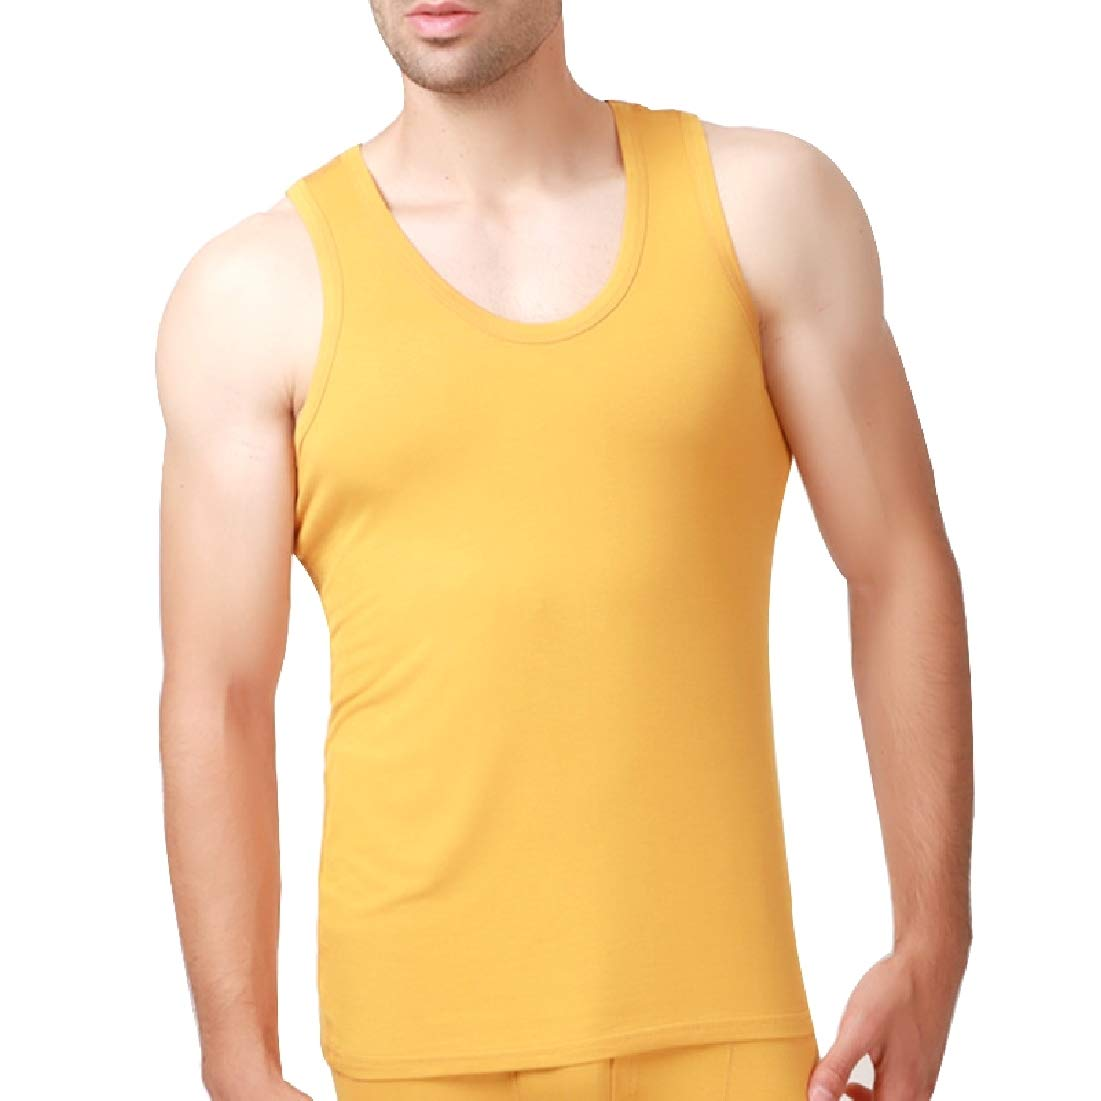 Andopa Mens Stretch Oversized Active Sleeveless Modal Cotton Tank Top